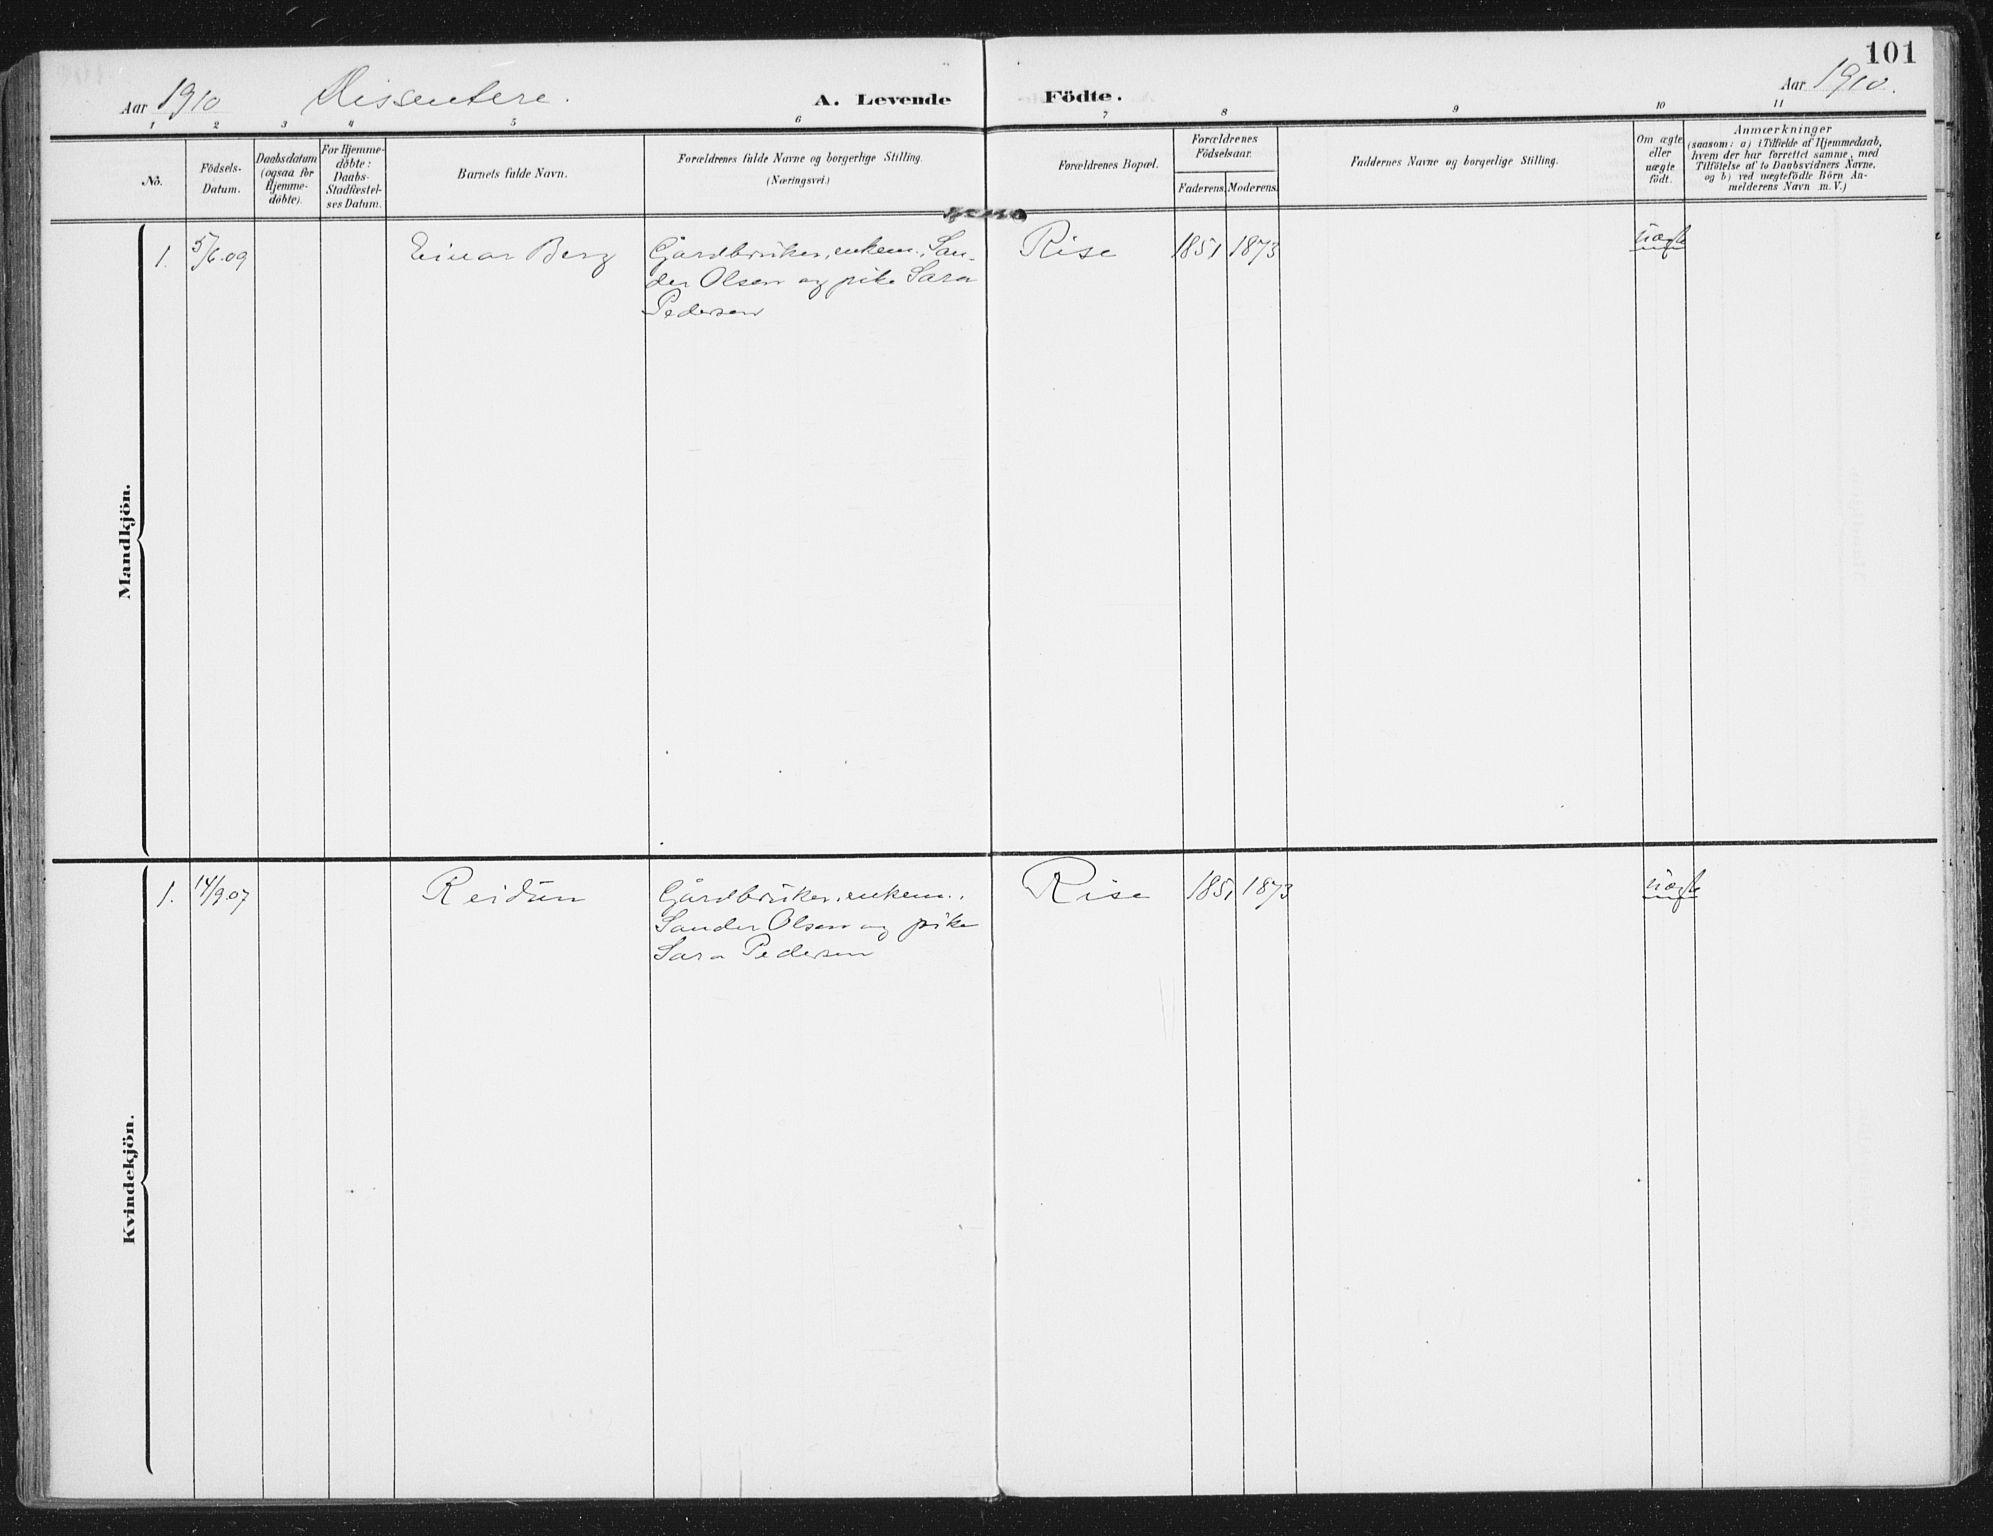 SAT, Ministerialprotokoller, klokkerbøker og fødselsregistre - Nordland, 892/L1321: Ministerialbok nr. 892A02, 1902-1918, s. 101